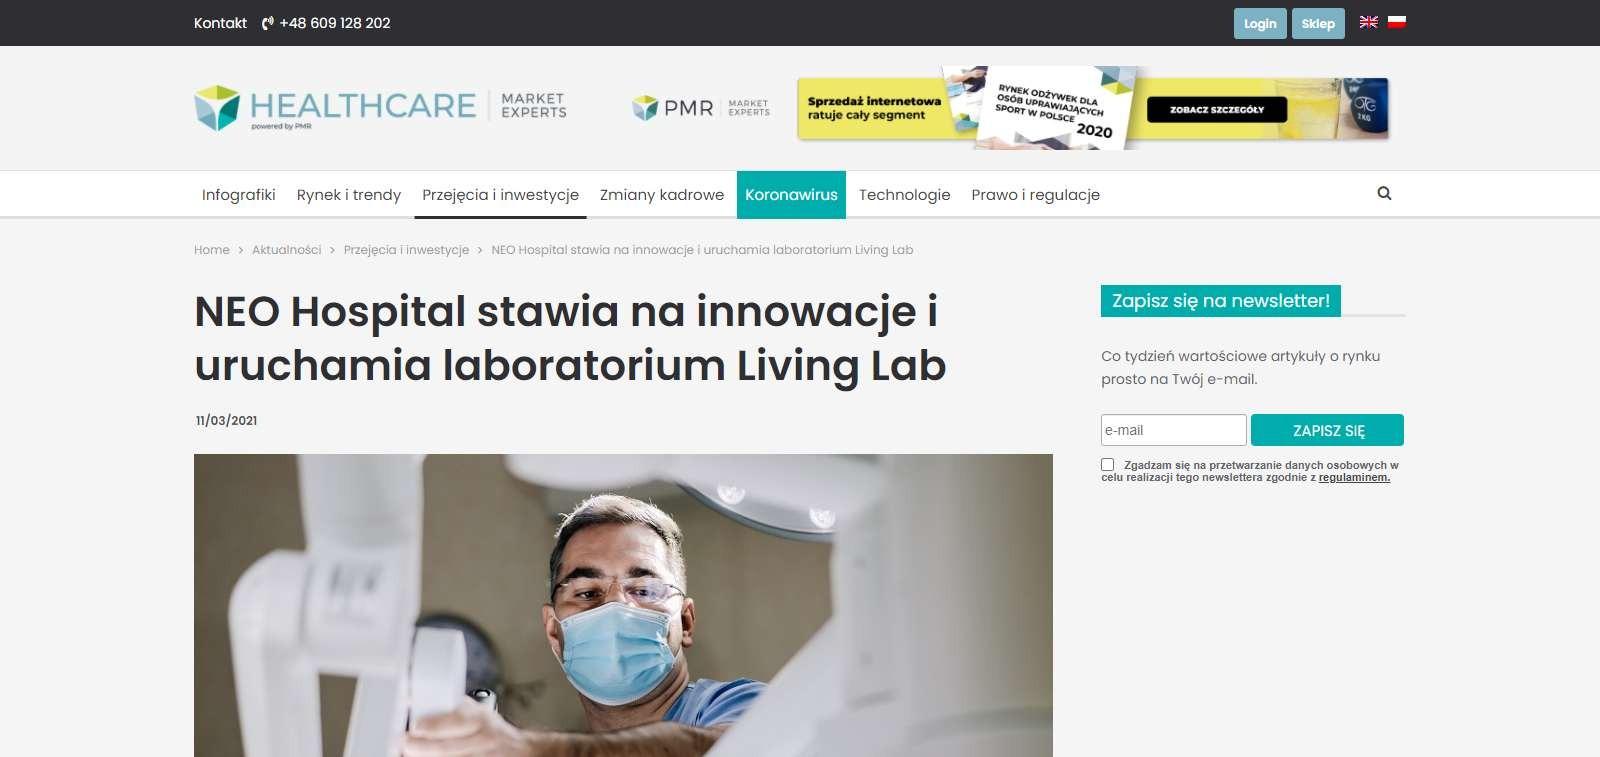 neo hospital stawia na innowacje i uruchamia laboratorium living lab